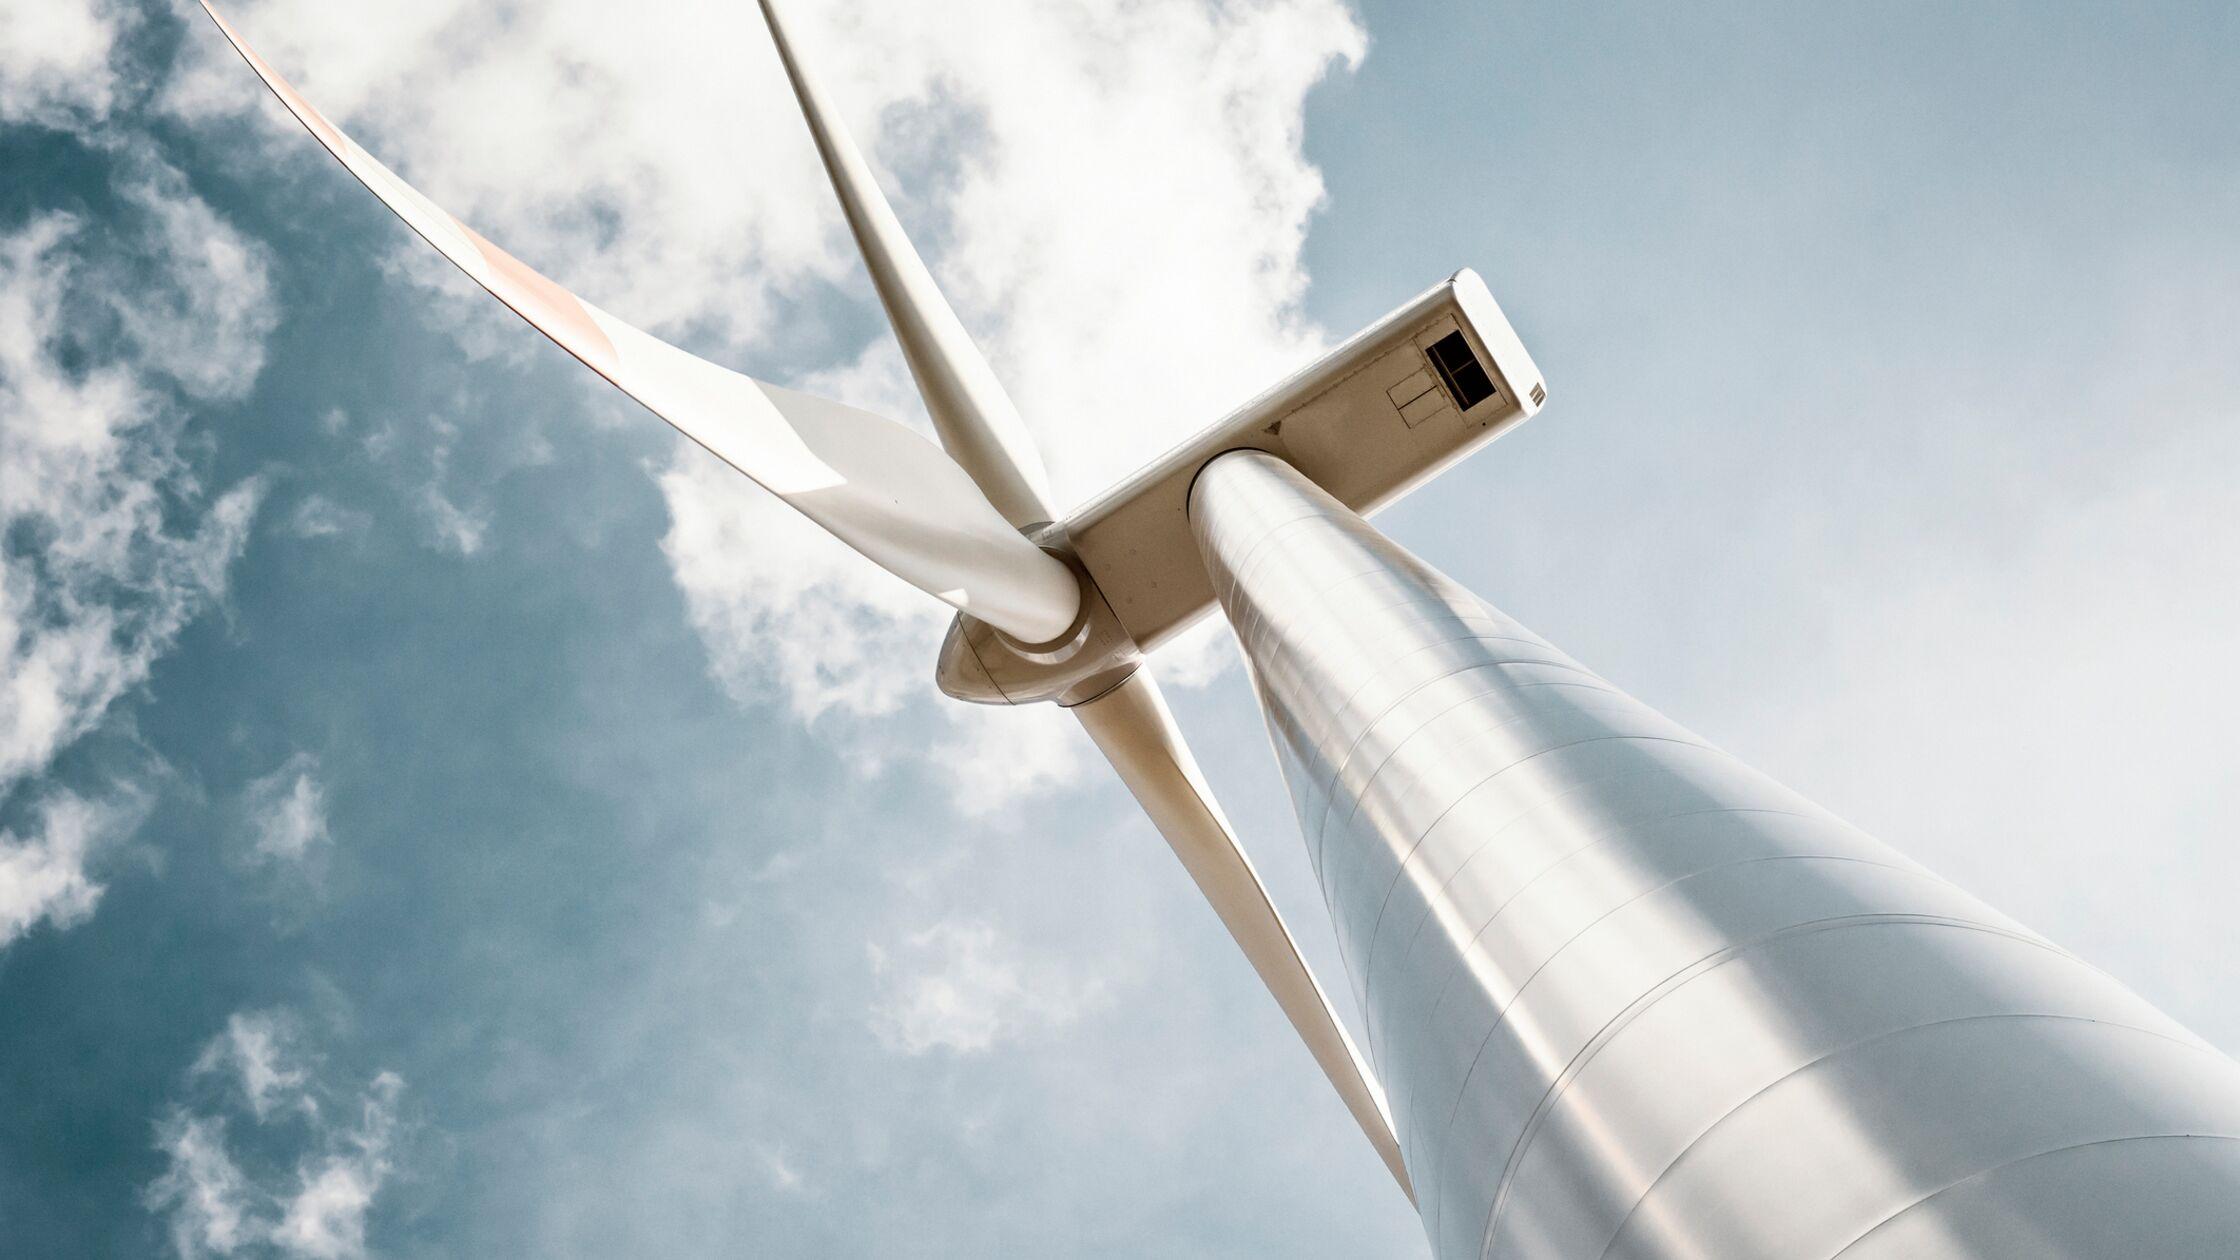 Windrad macht Energie